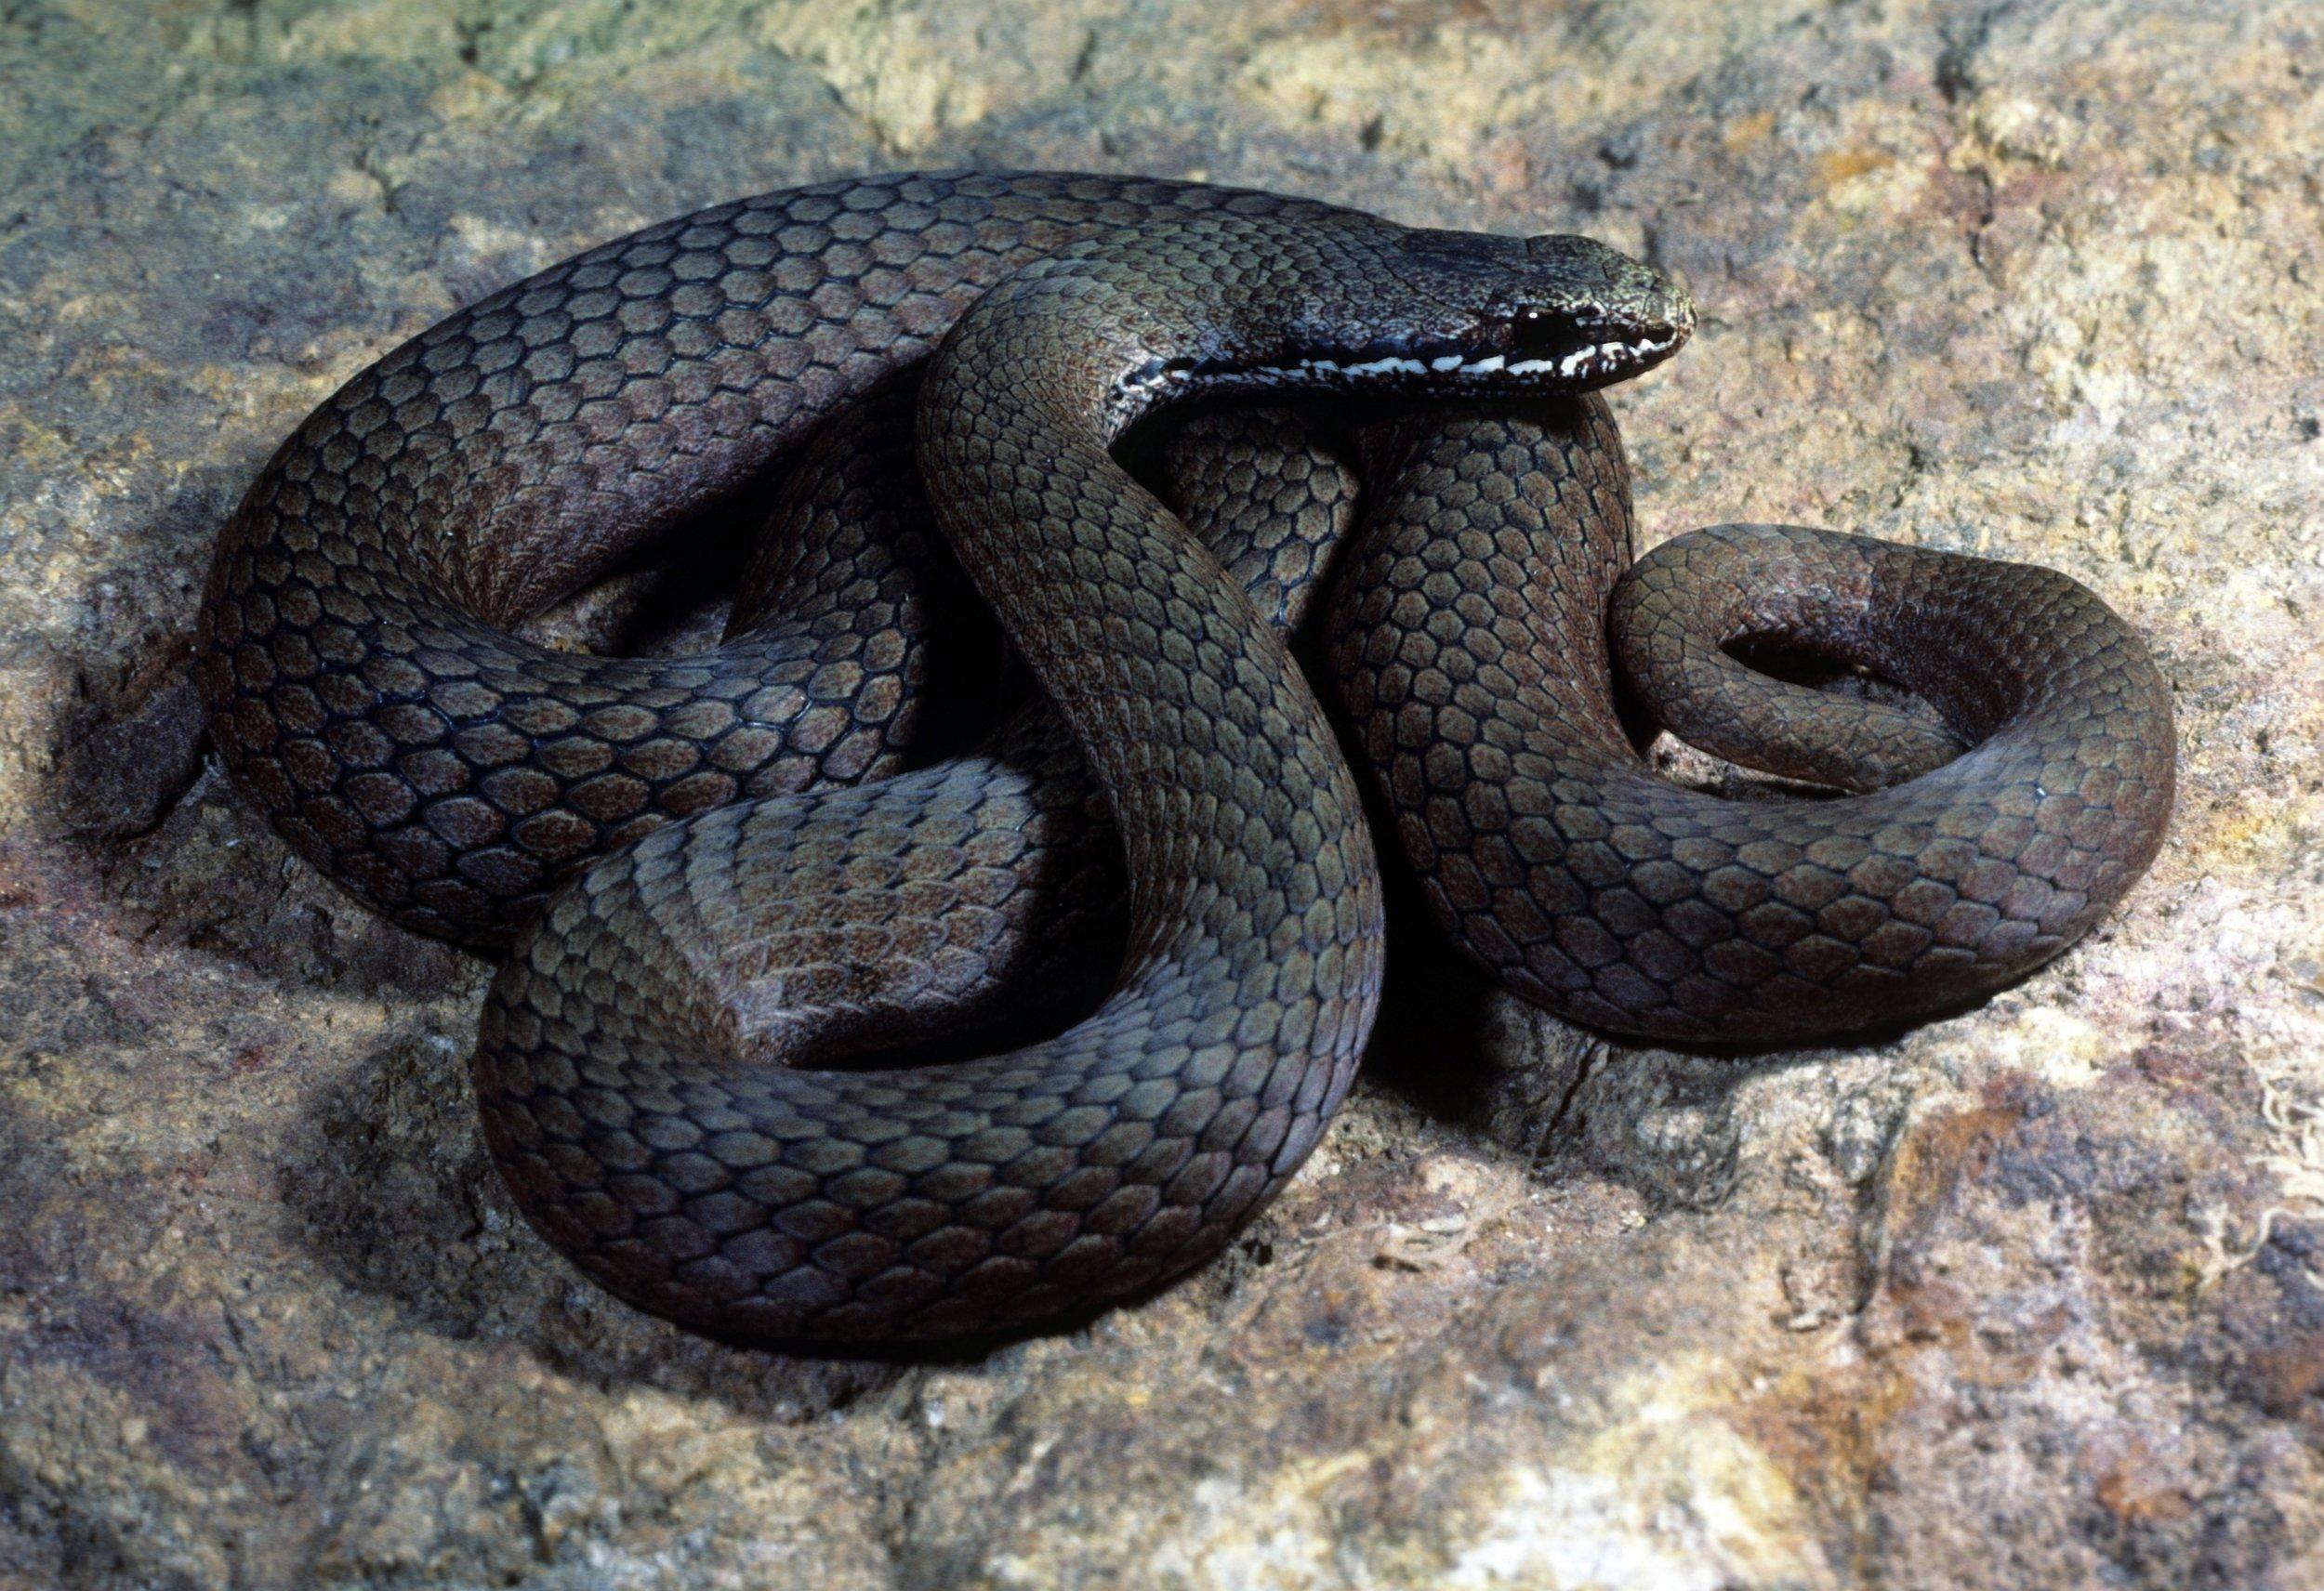 How the sea snake got its stripes